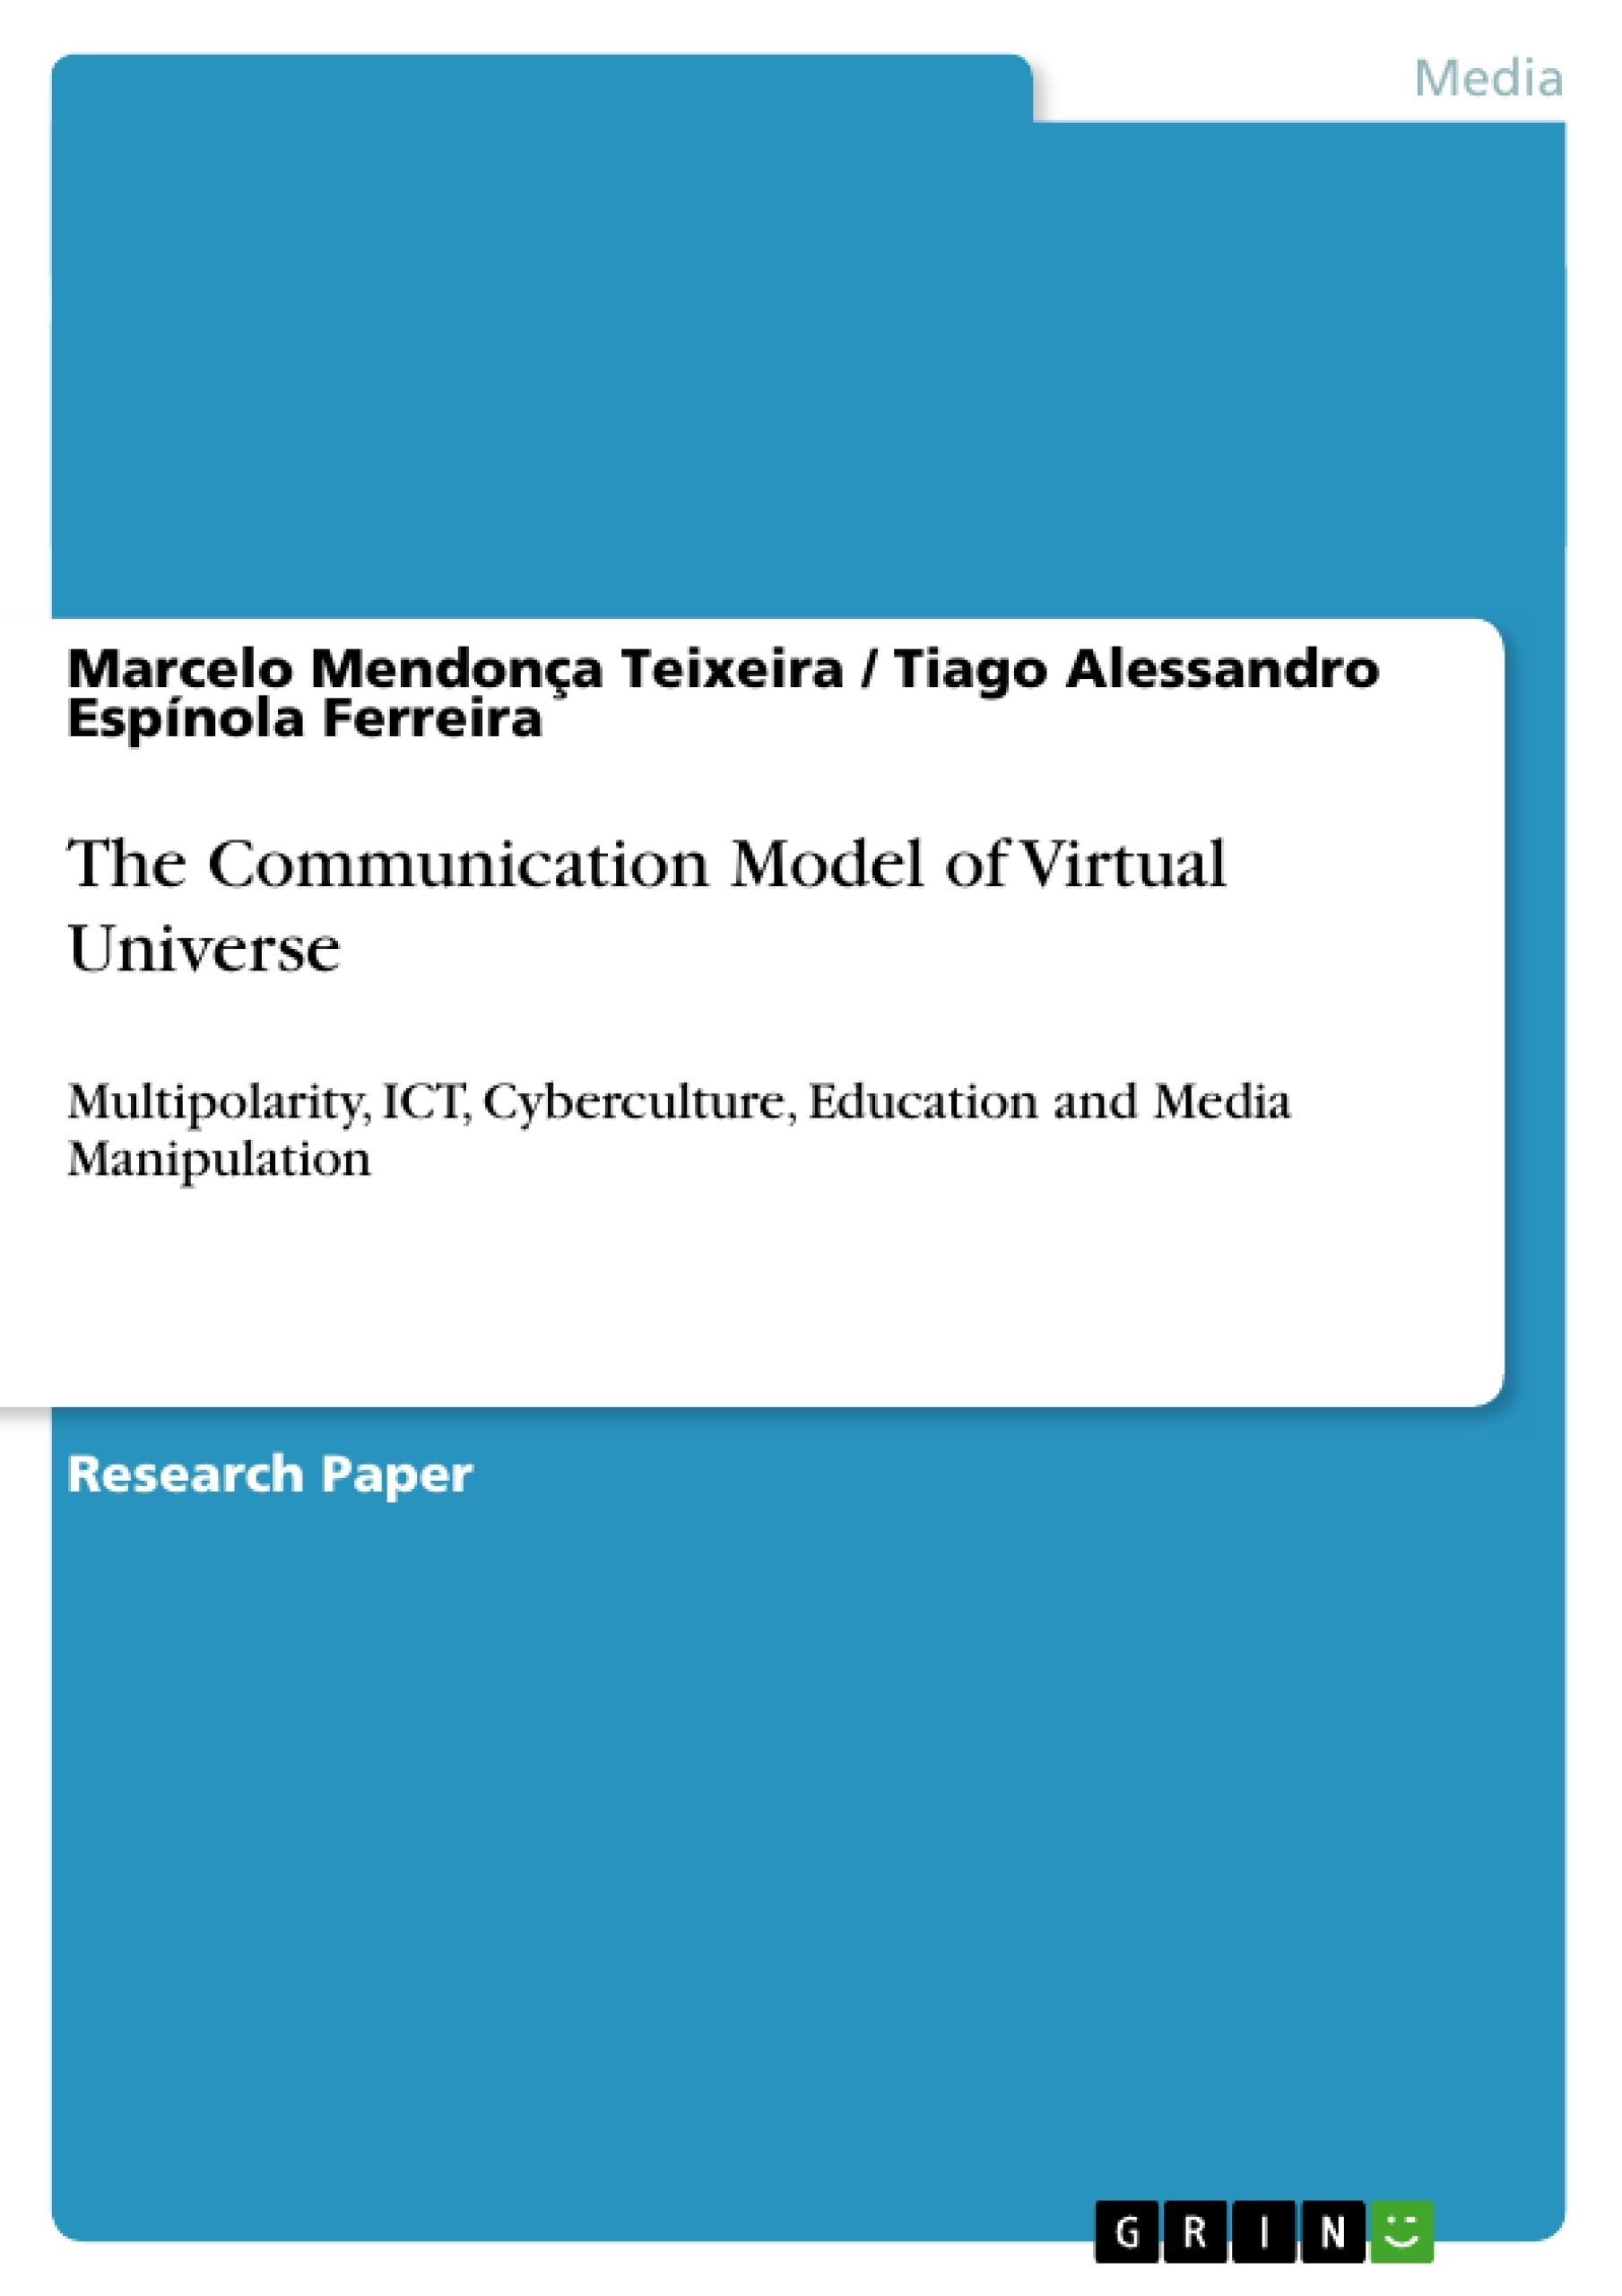 Title: The Communication Model of Virtual Universe